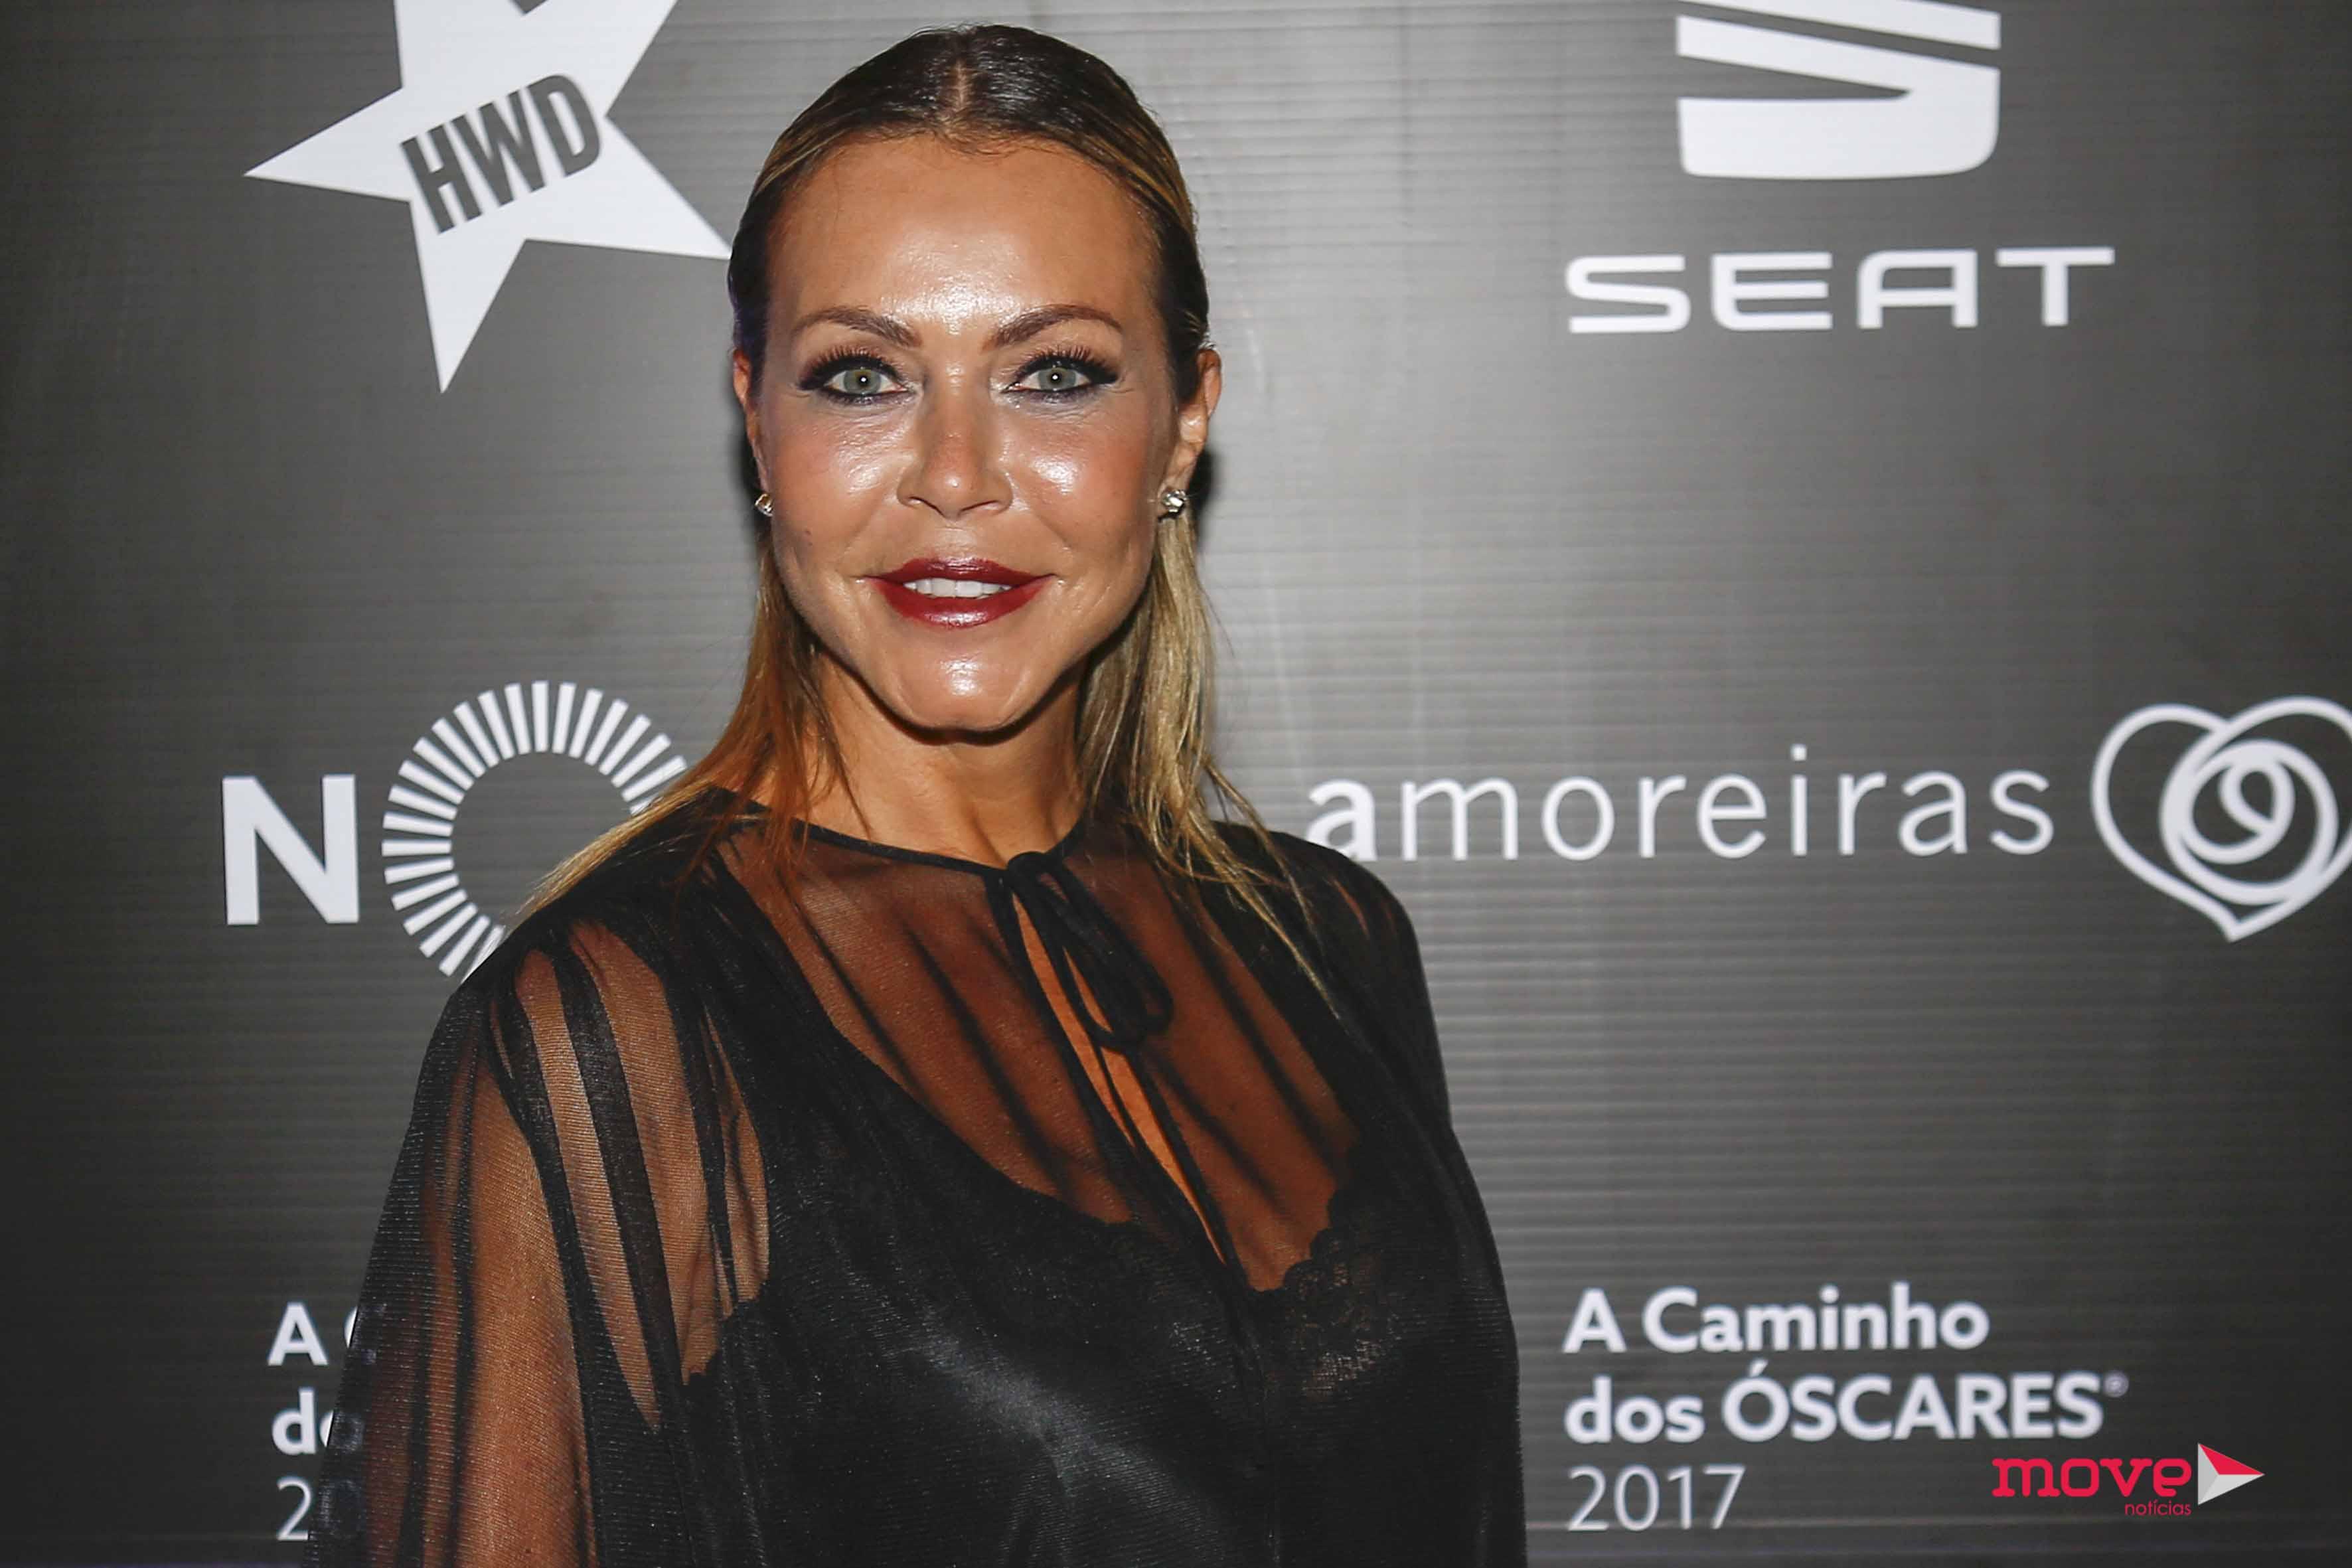 Elsa Raposo Regressa A Portugal Apos Sofrer Embolia Pulmonar